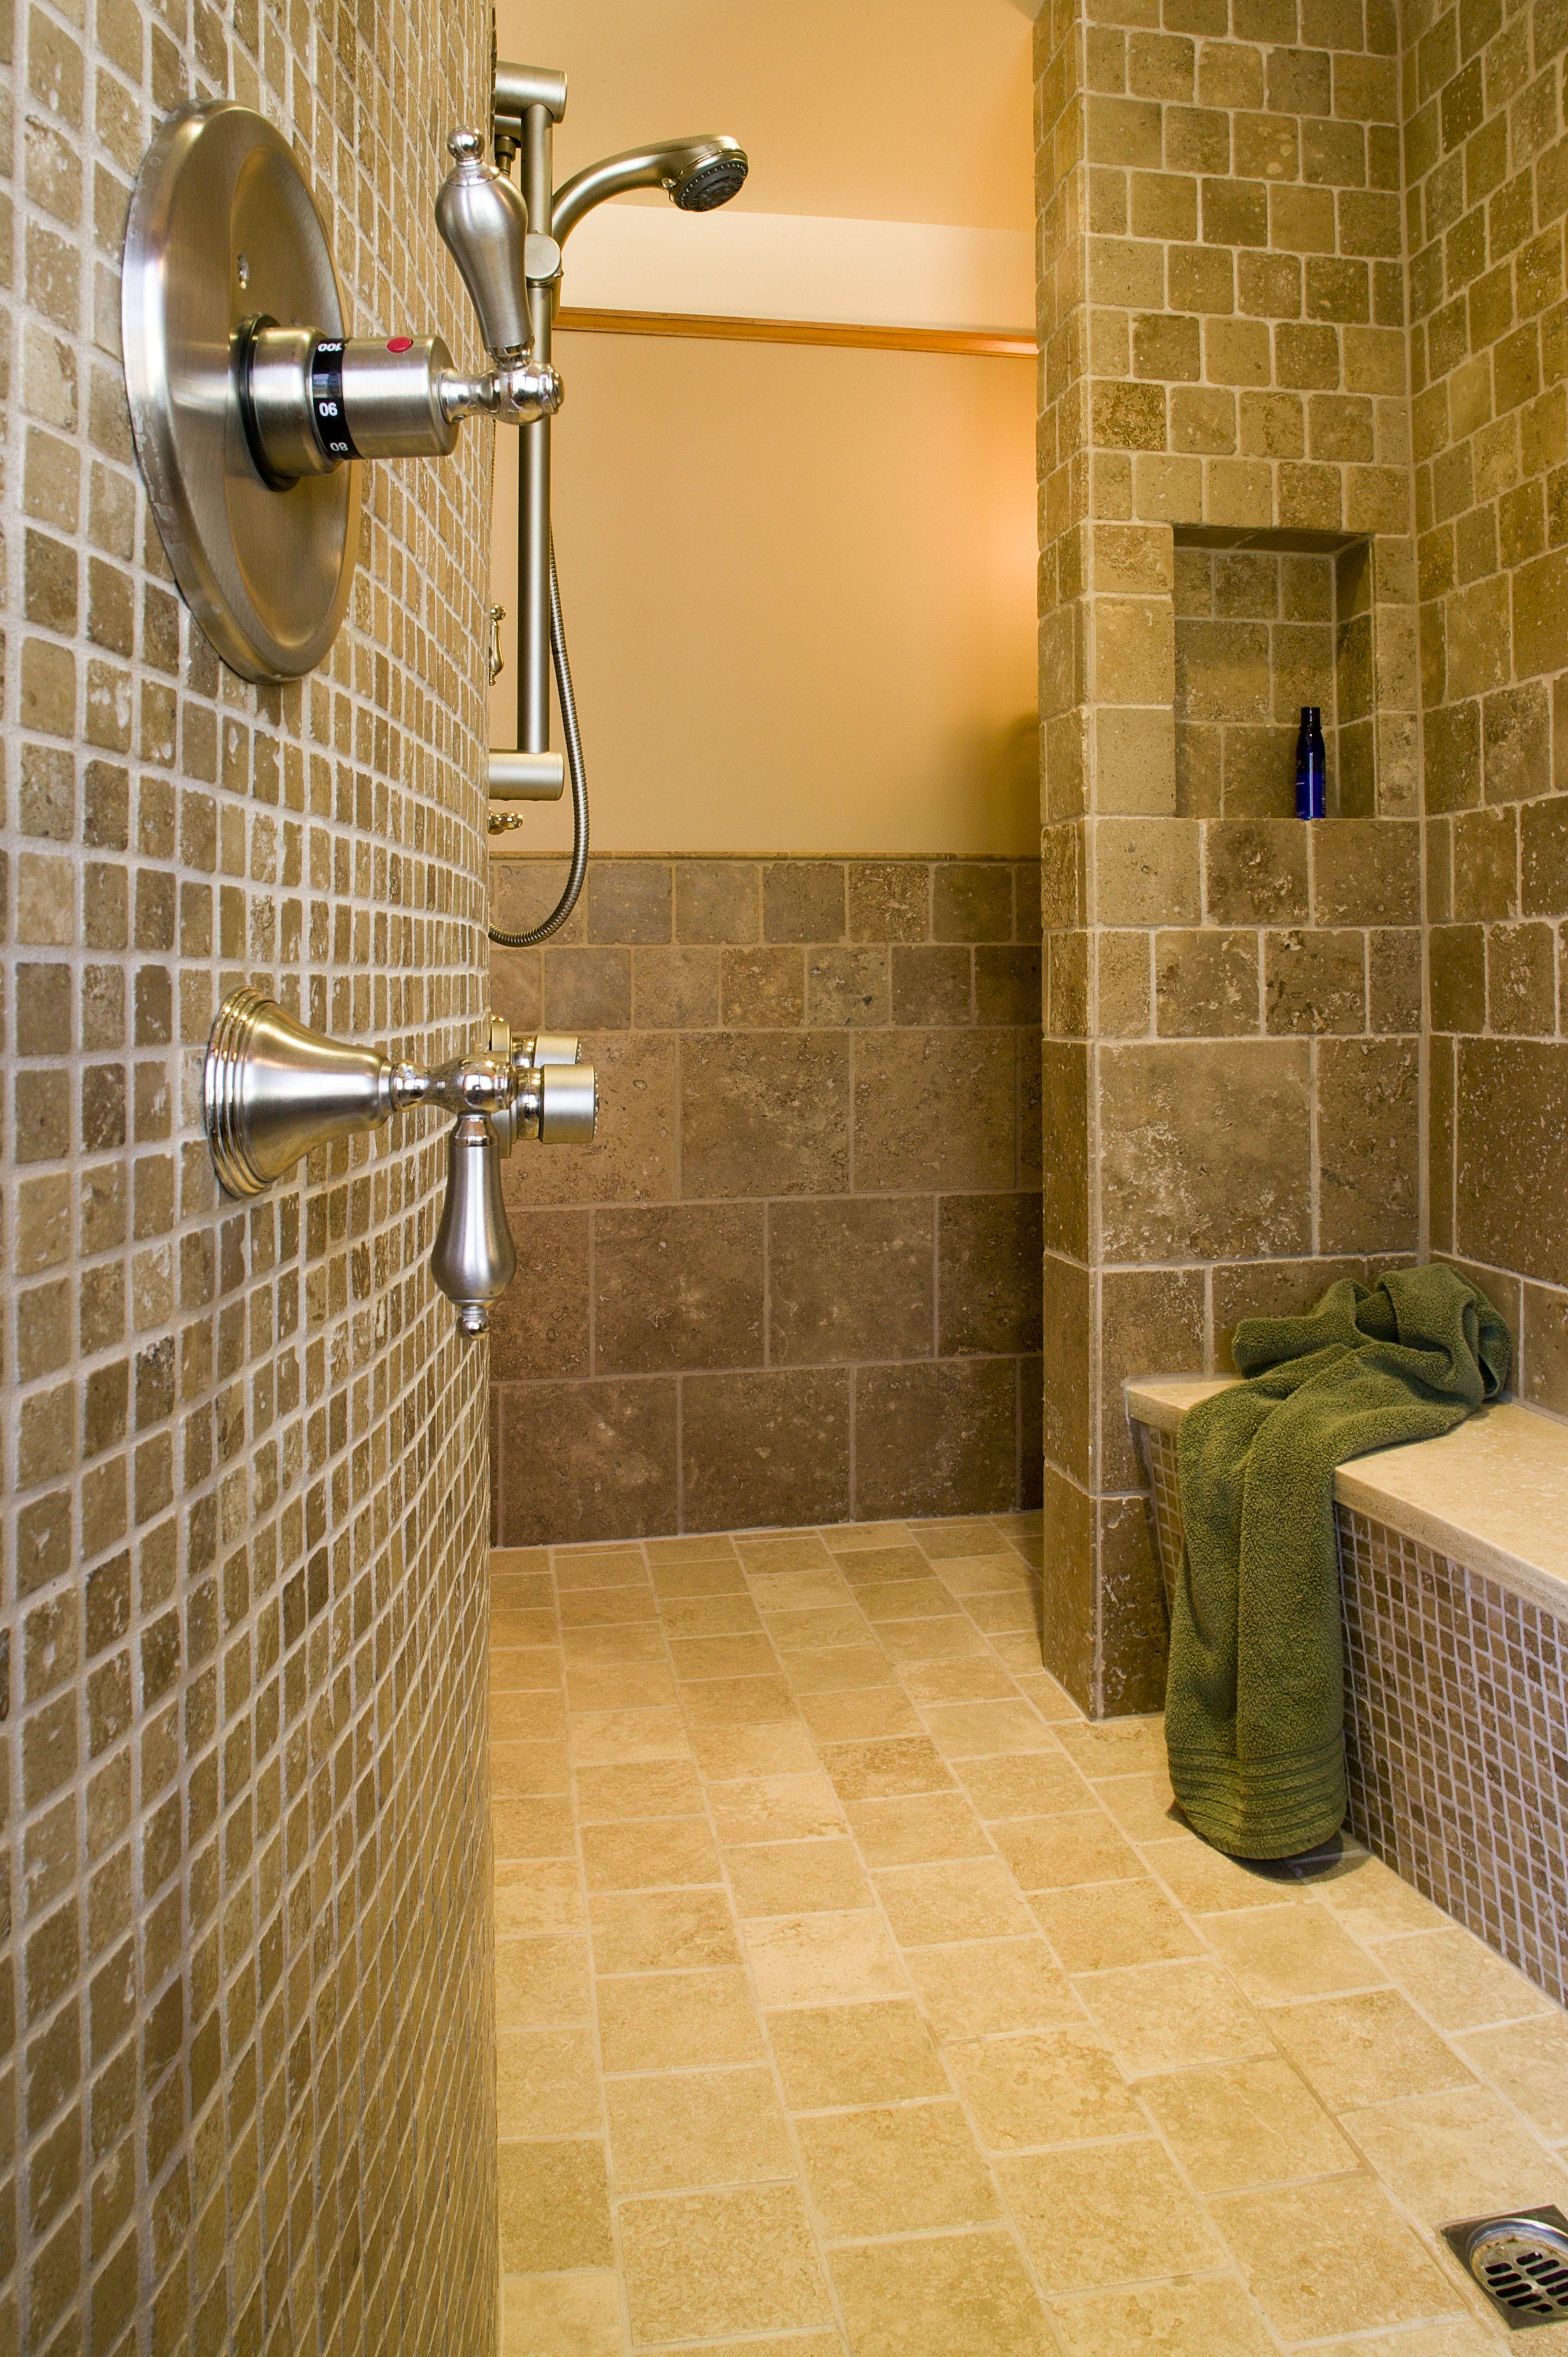 Radiant Heated Floors Incorporated Where Stone Flooring Is Installed - Heated floor timer